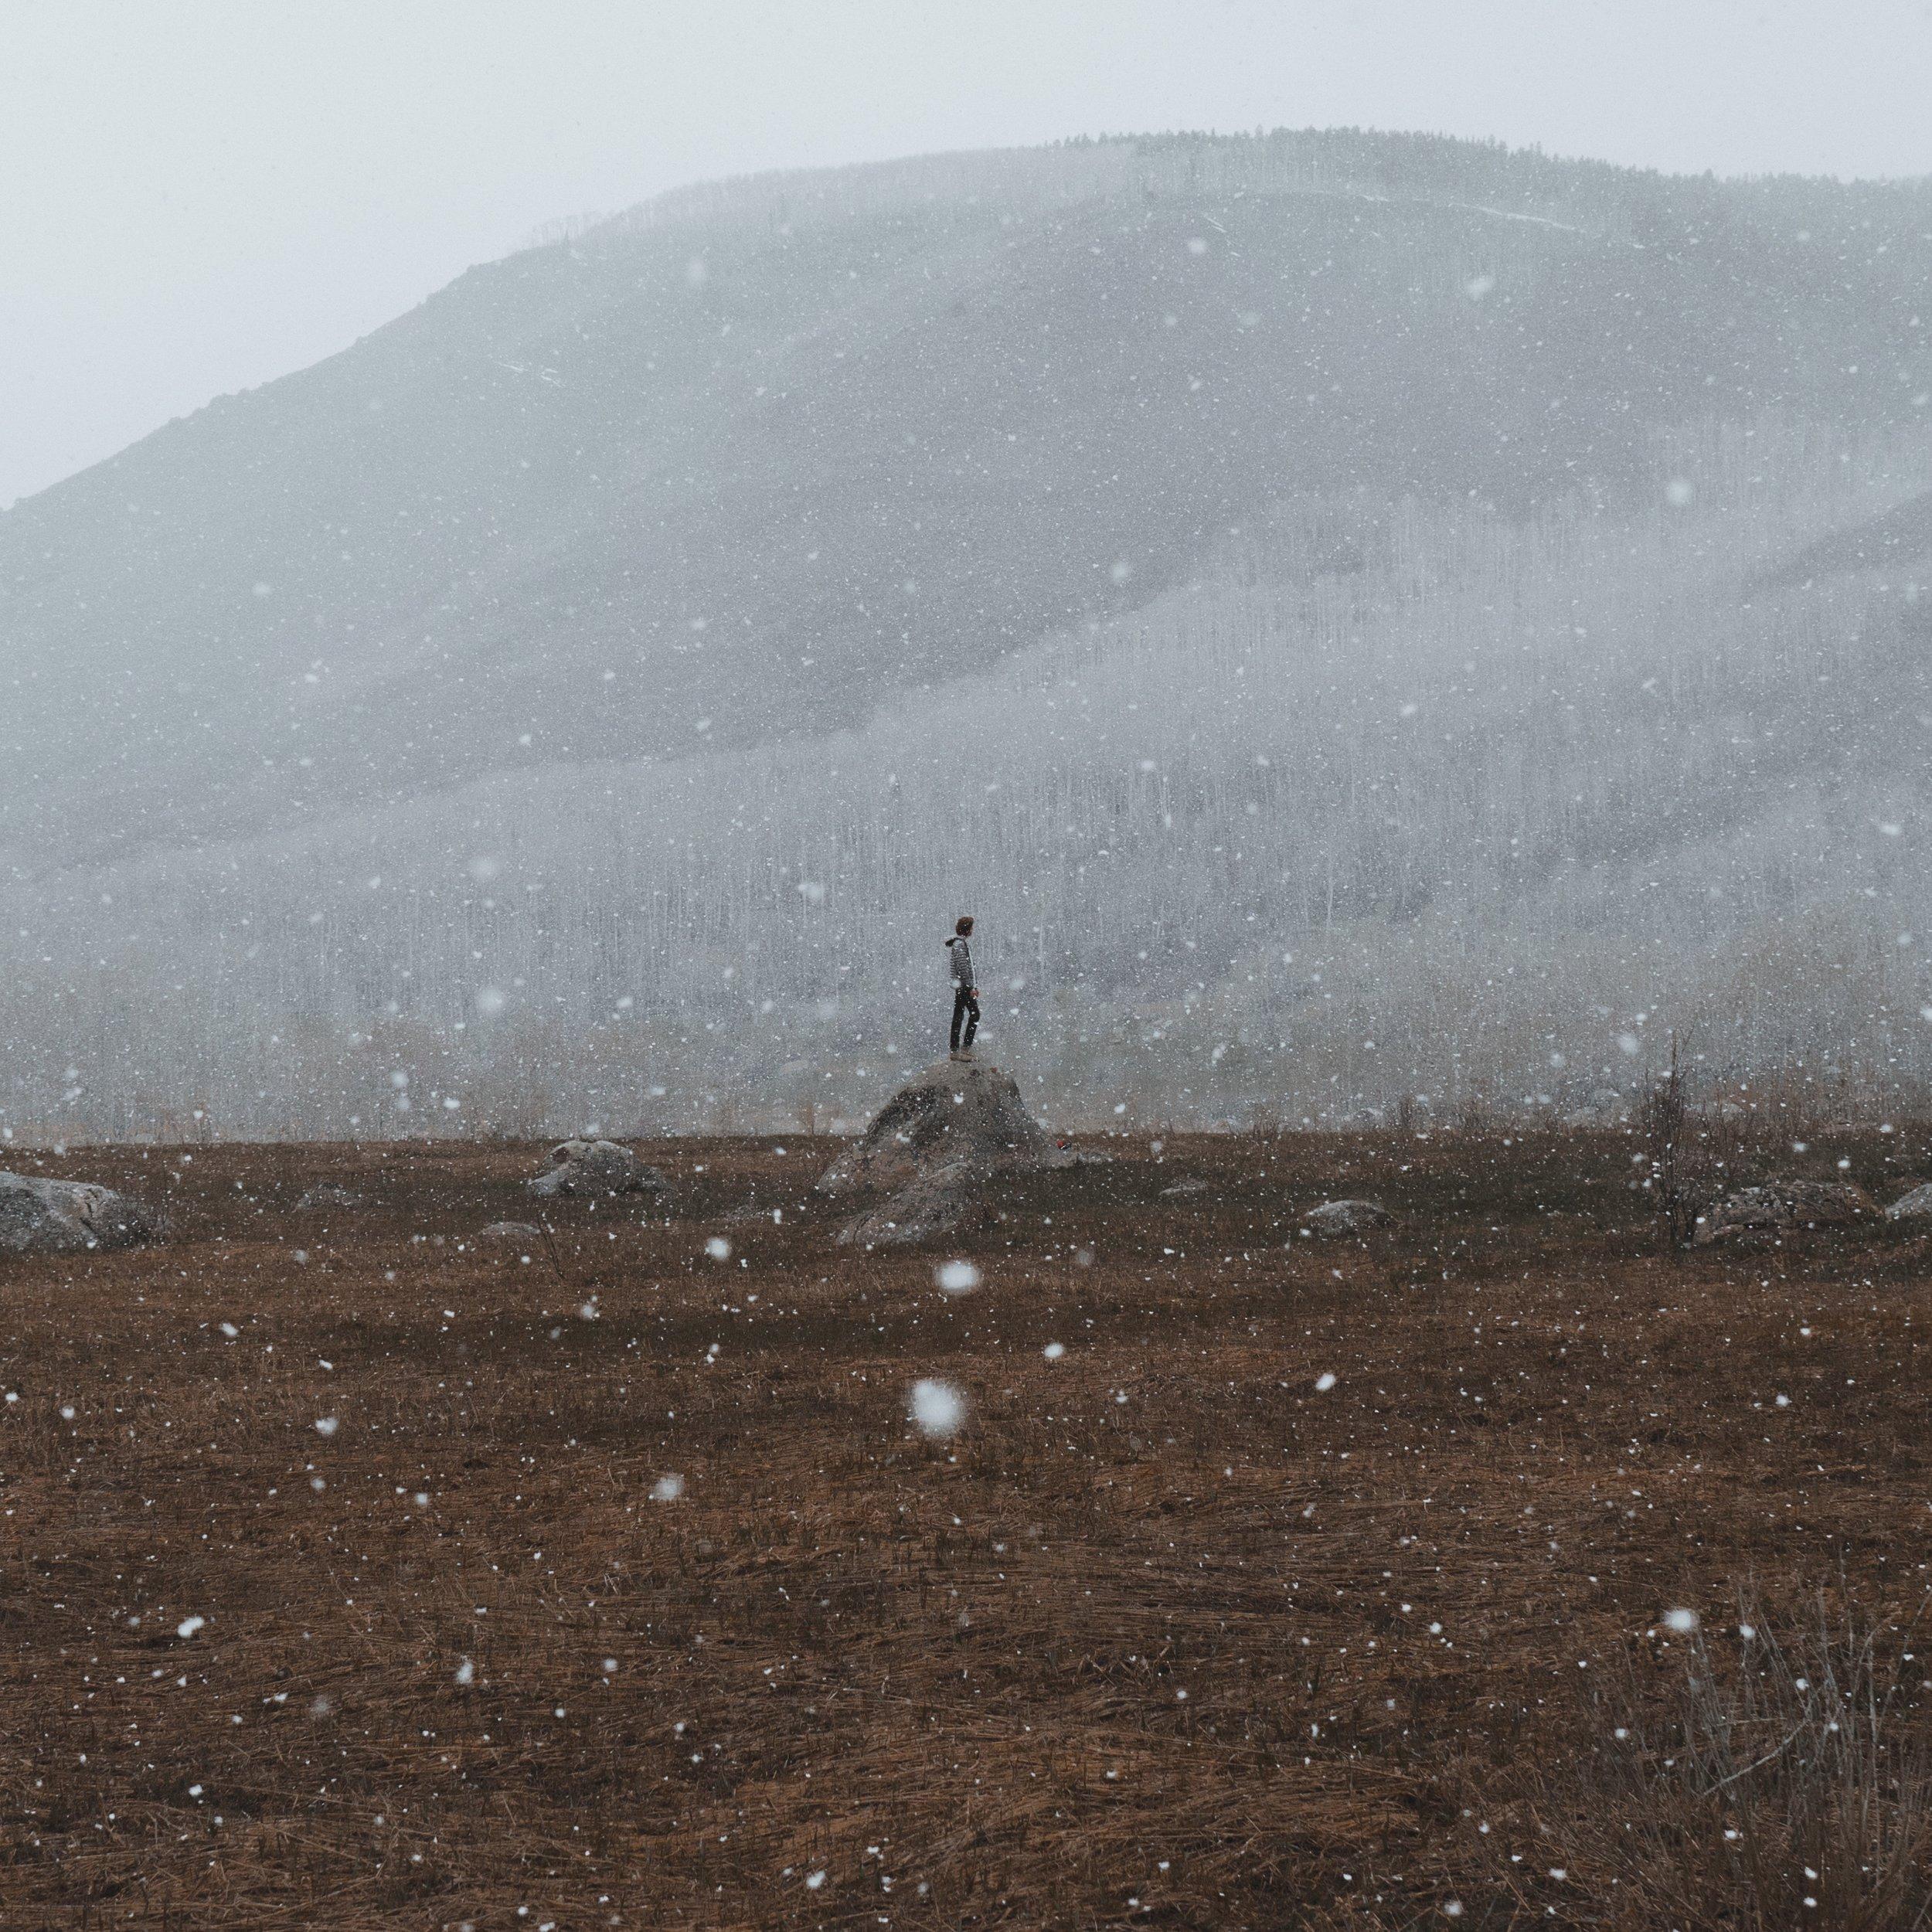 hunter-bryant-90256-unsplash.jpg